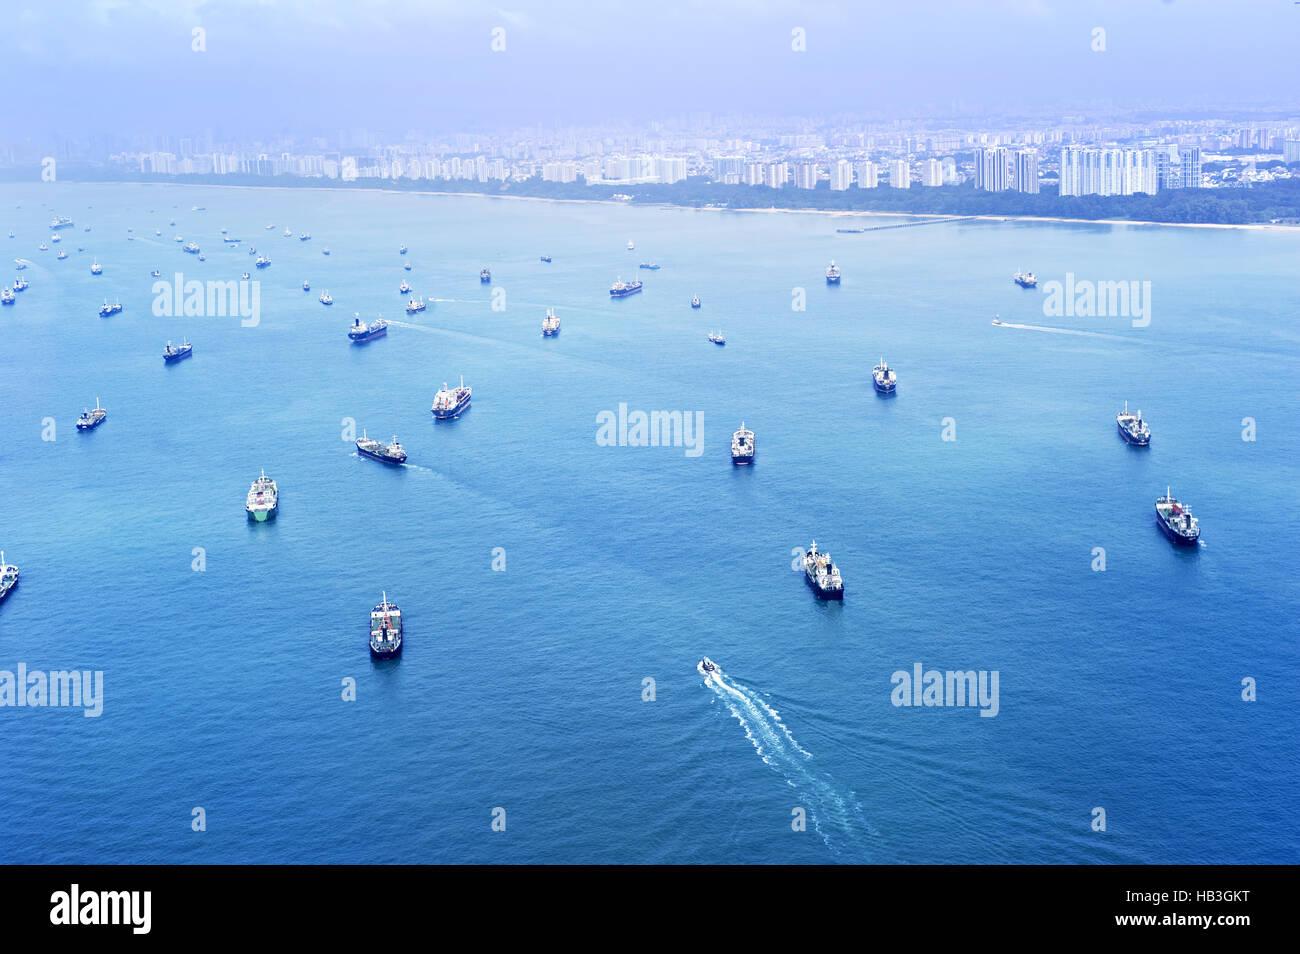 Singapore shipping industry - Stock Image